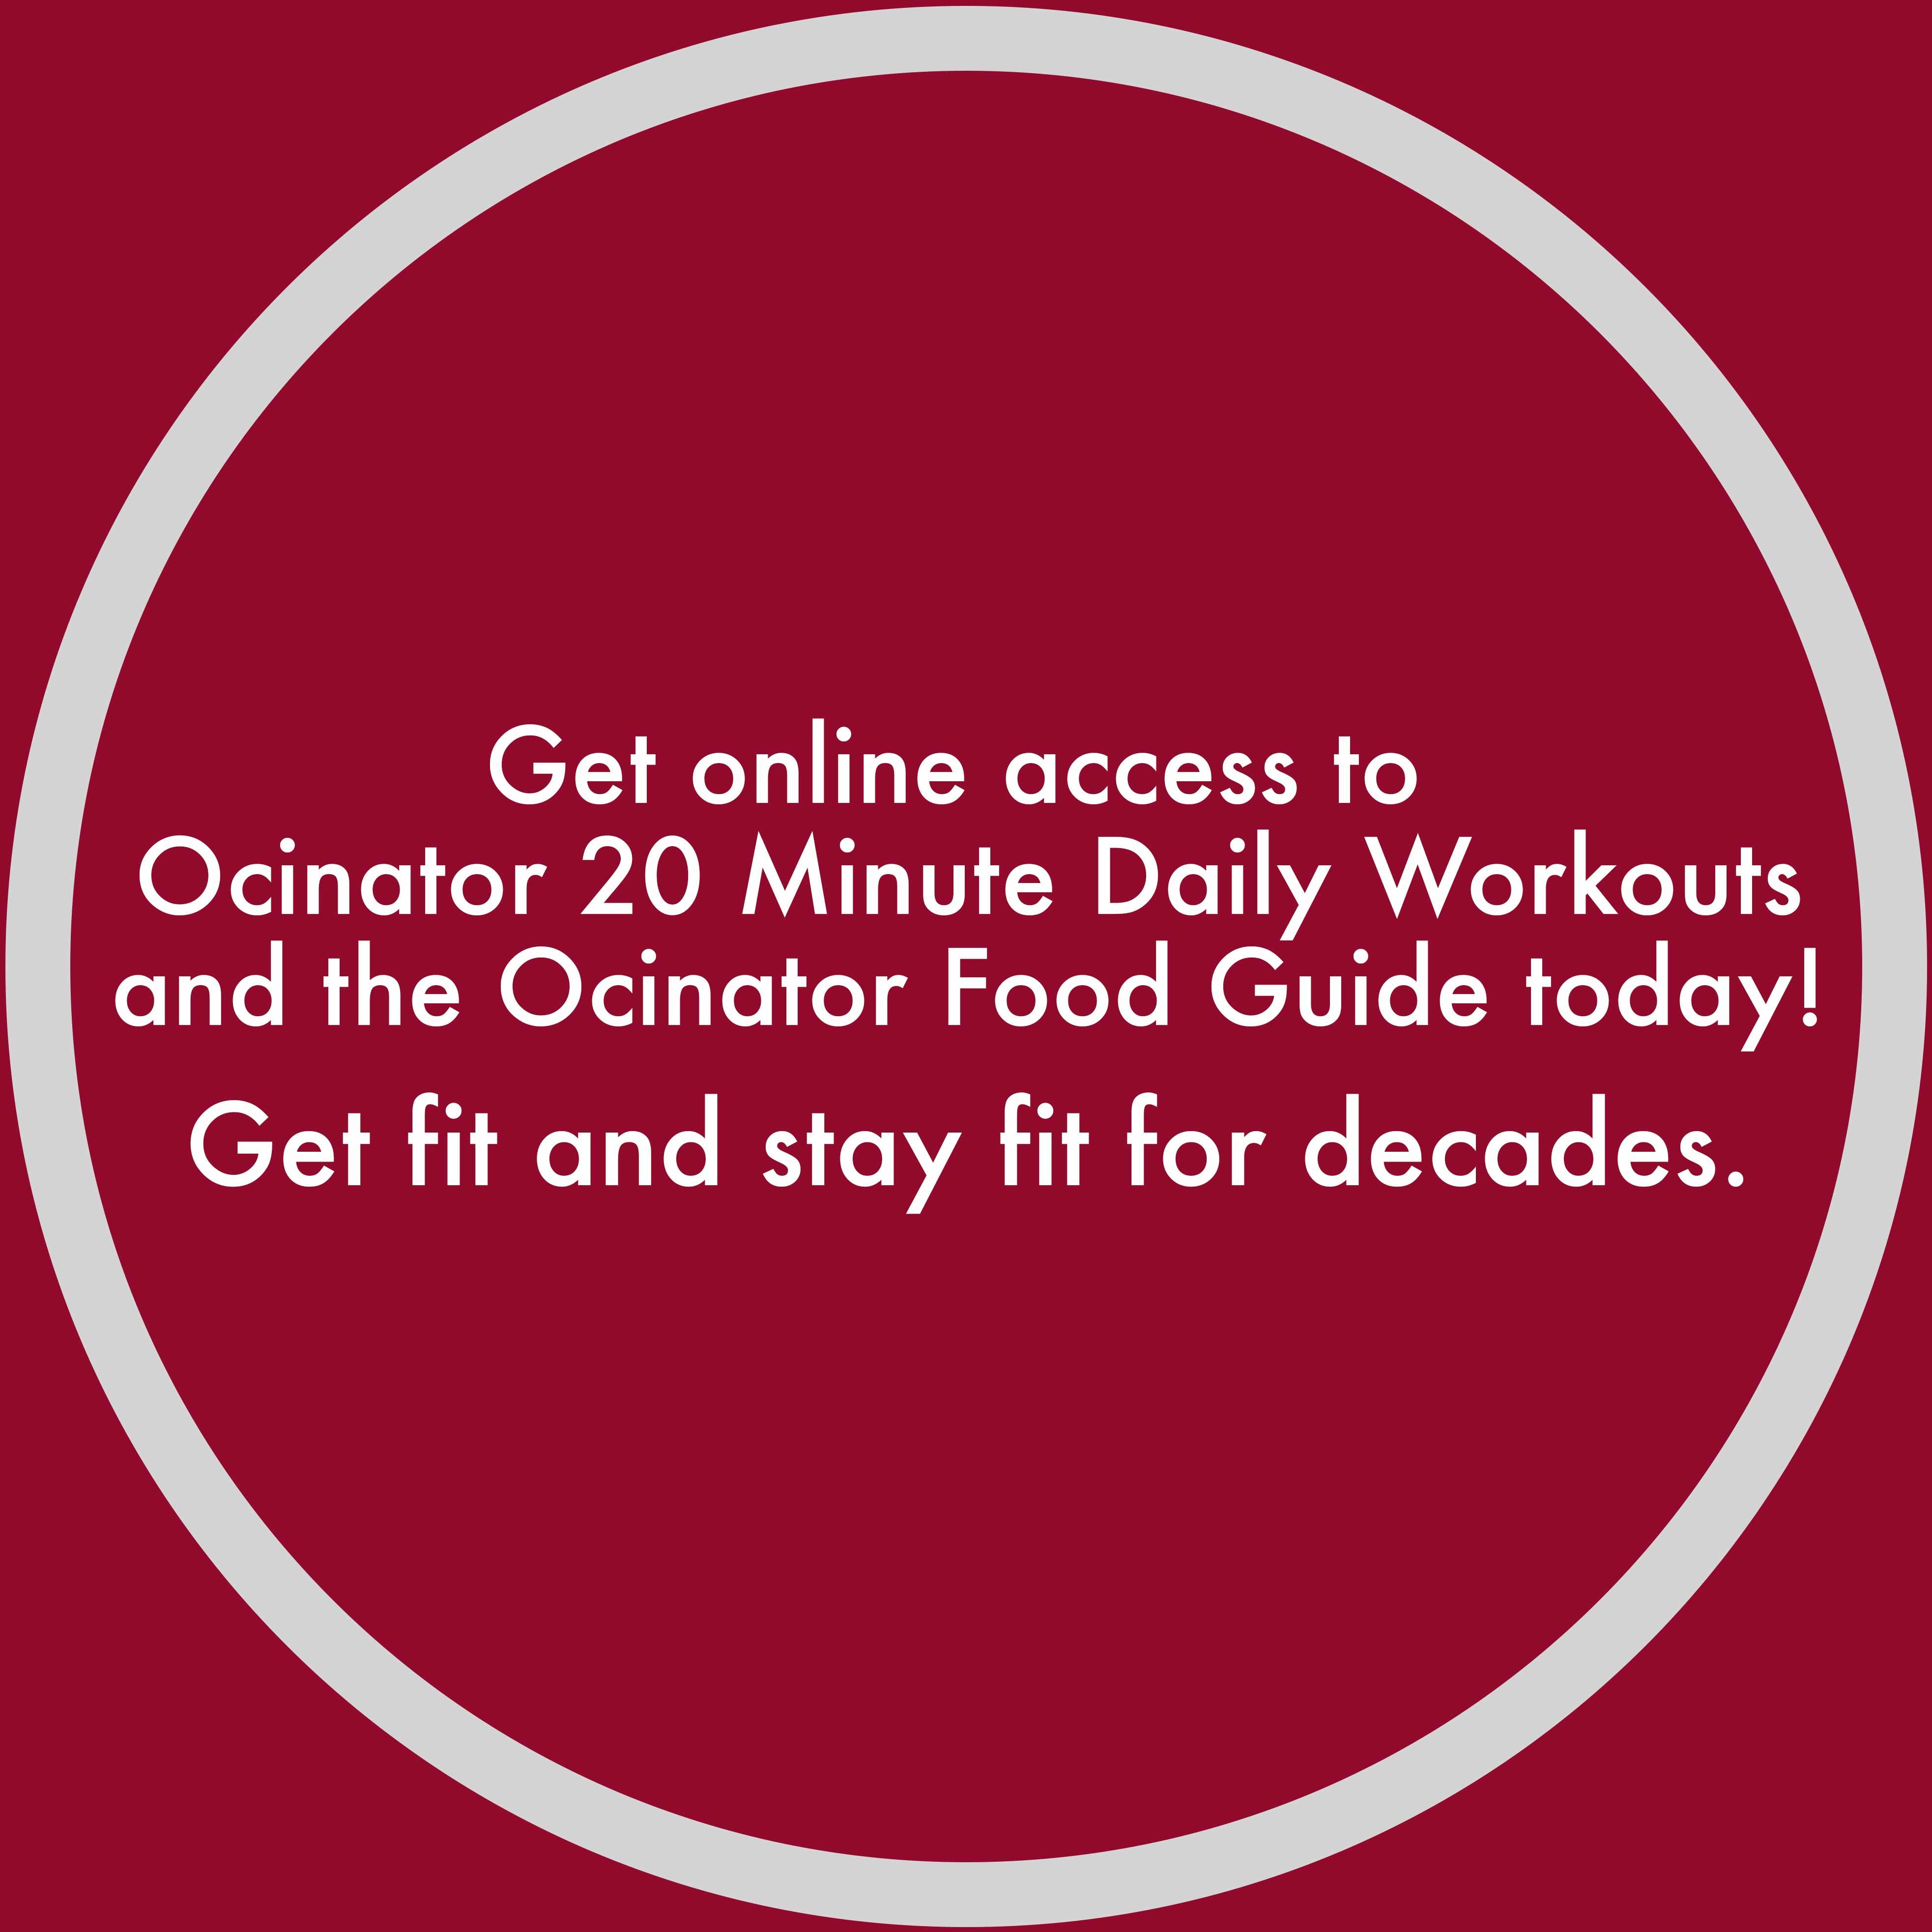 Get online access to ocinator Homepage